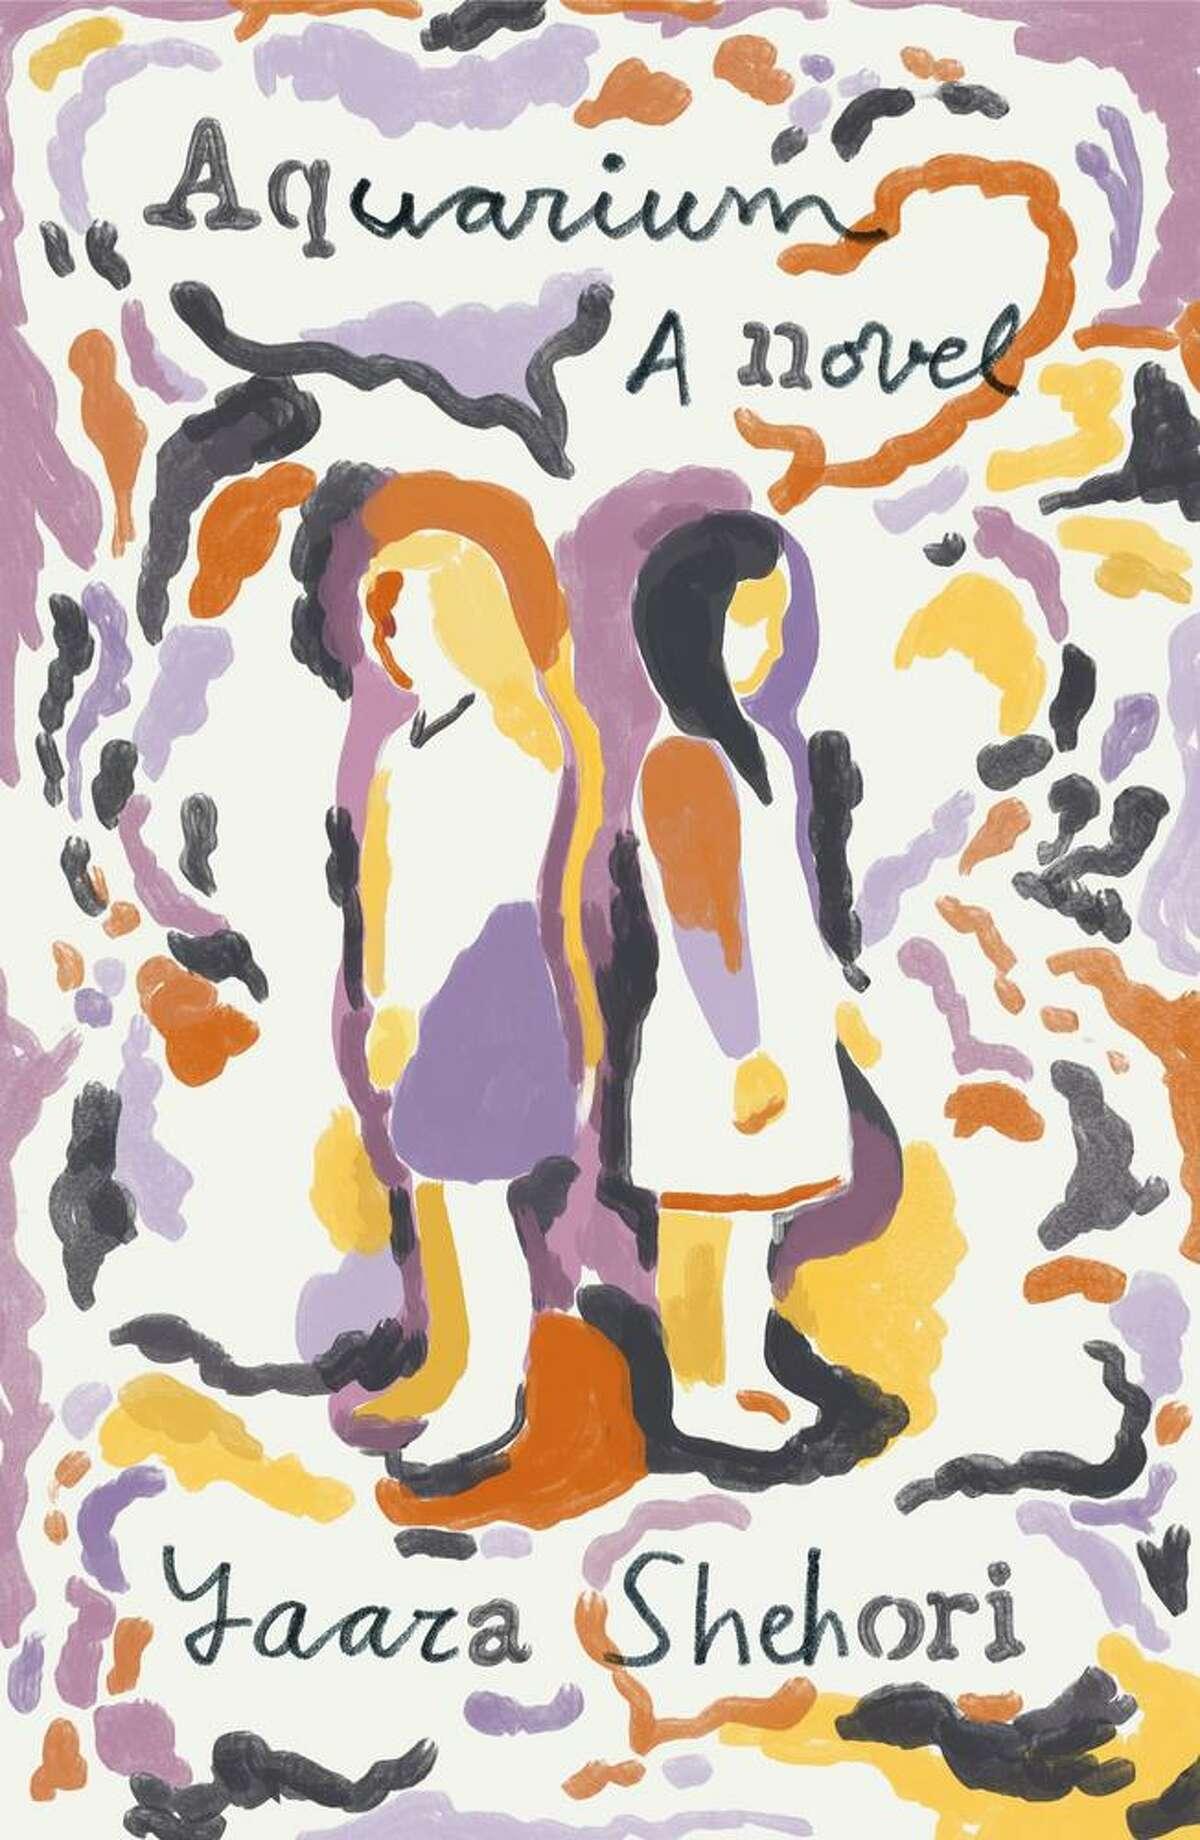 """Aquarium"" is Yaara Shehori's debut novel."